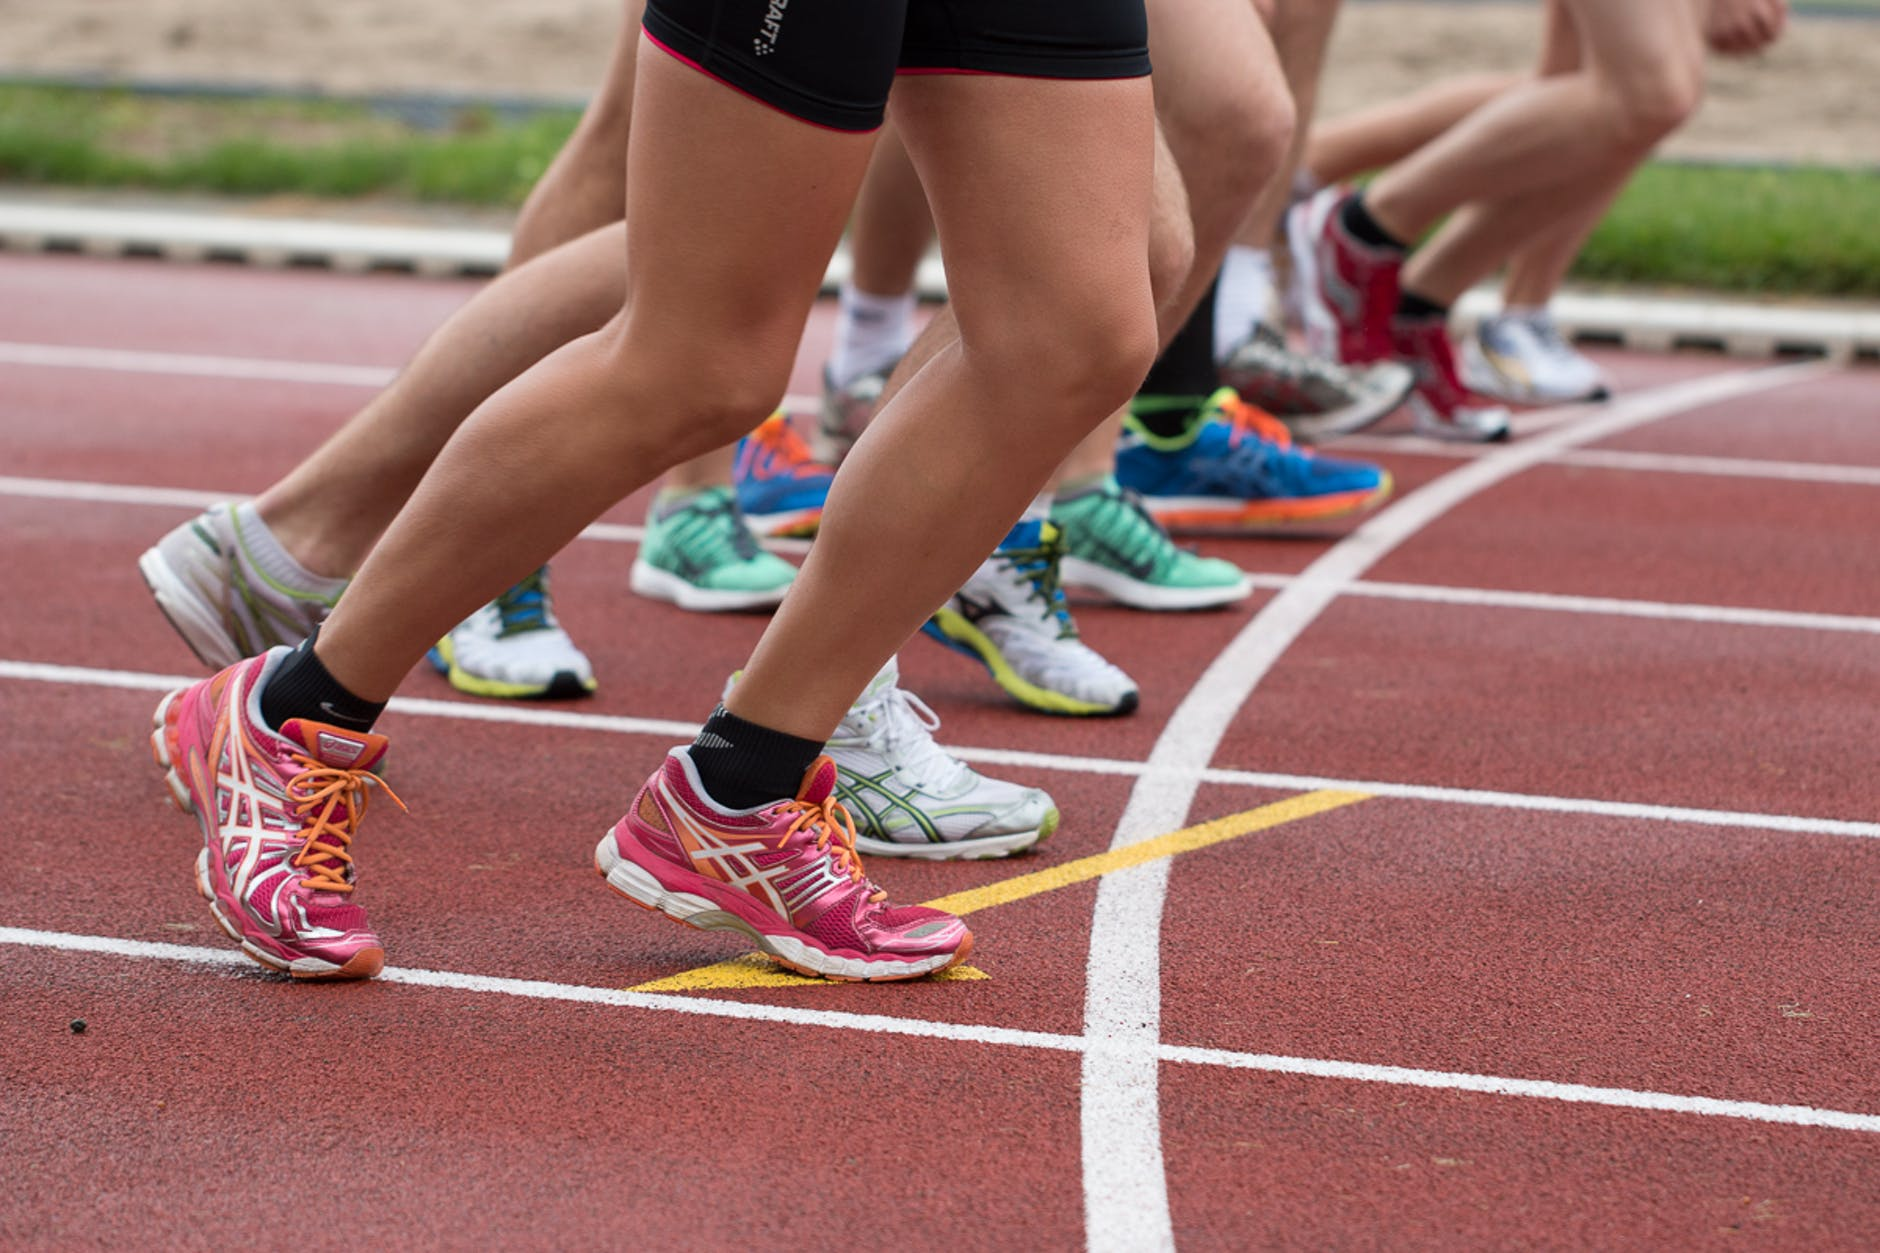 Save Tab Marathon, not Sprint